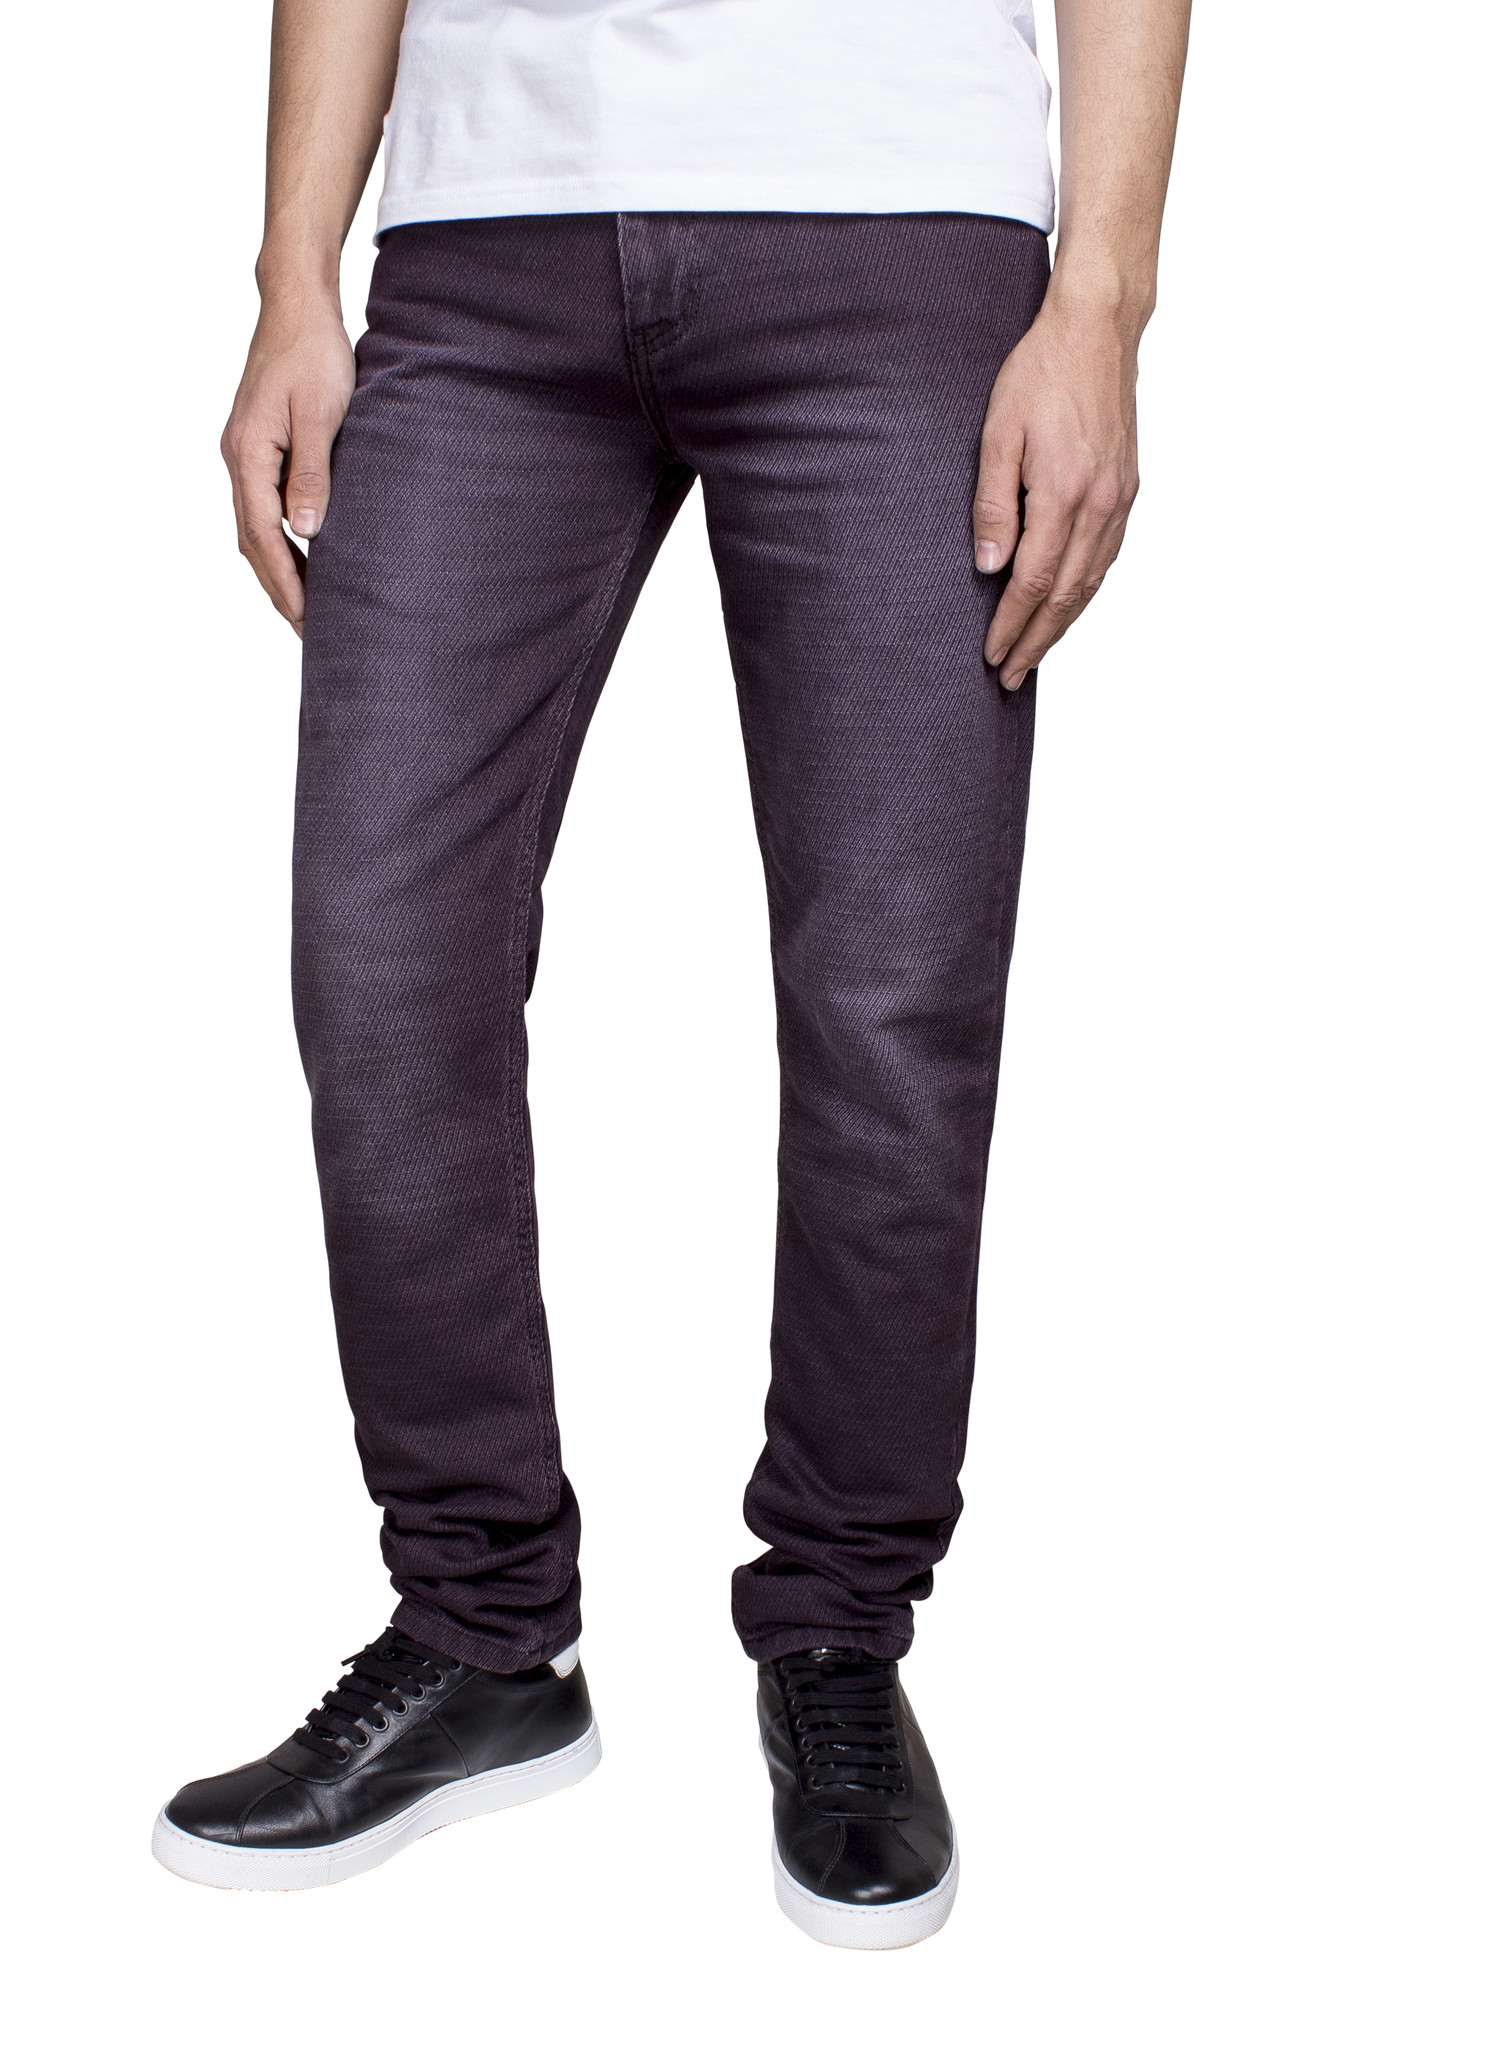 Arya Boy Jeans 82070 Brown